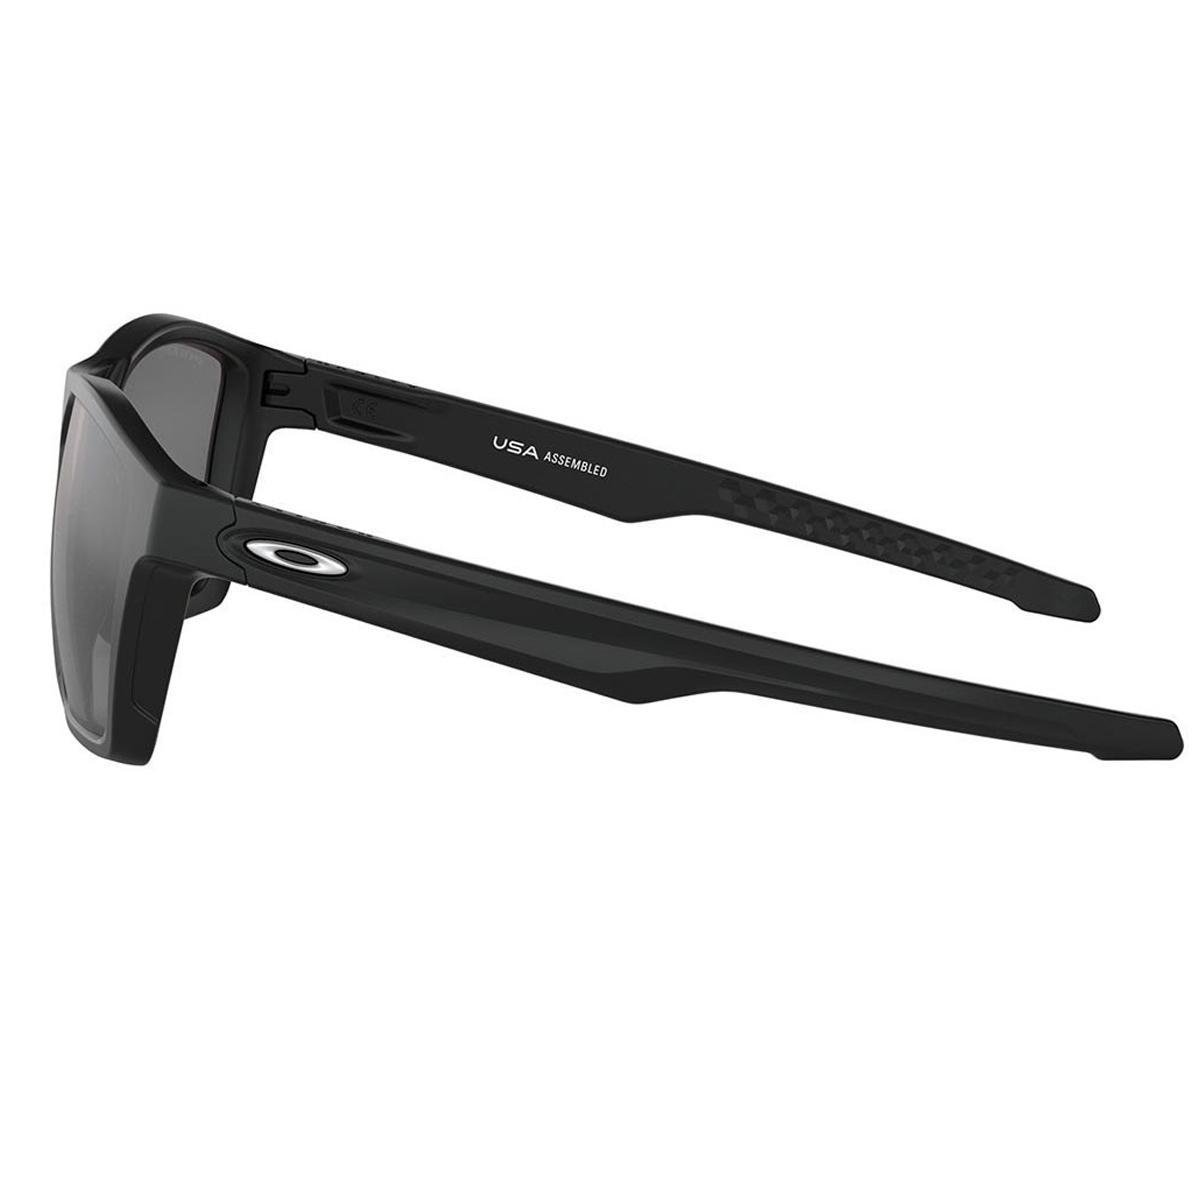 089bf09aff7a8 Óculos Oakley Targetline Matte Black   Prizm Black - Preto - Compre ...